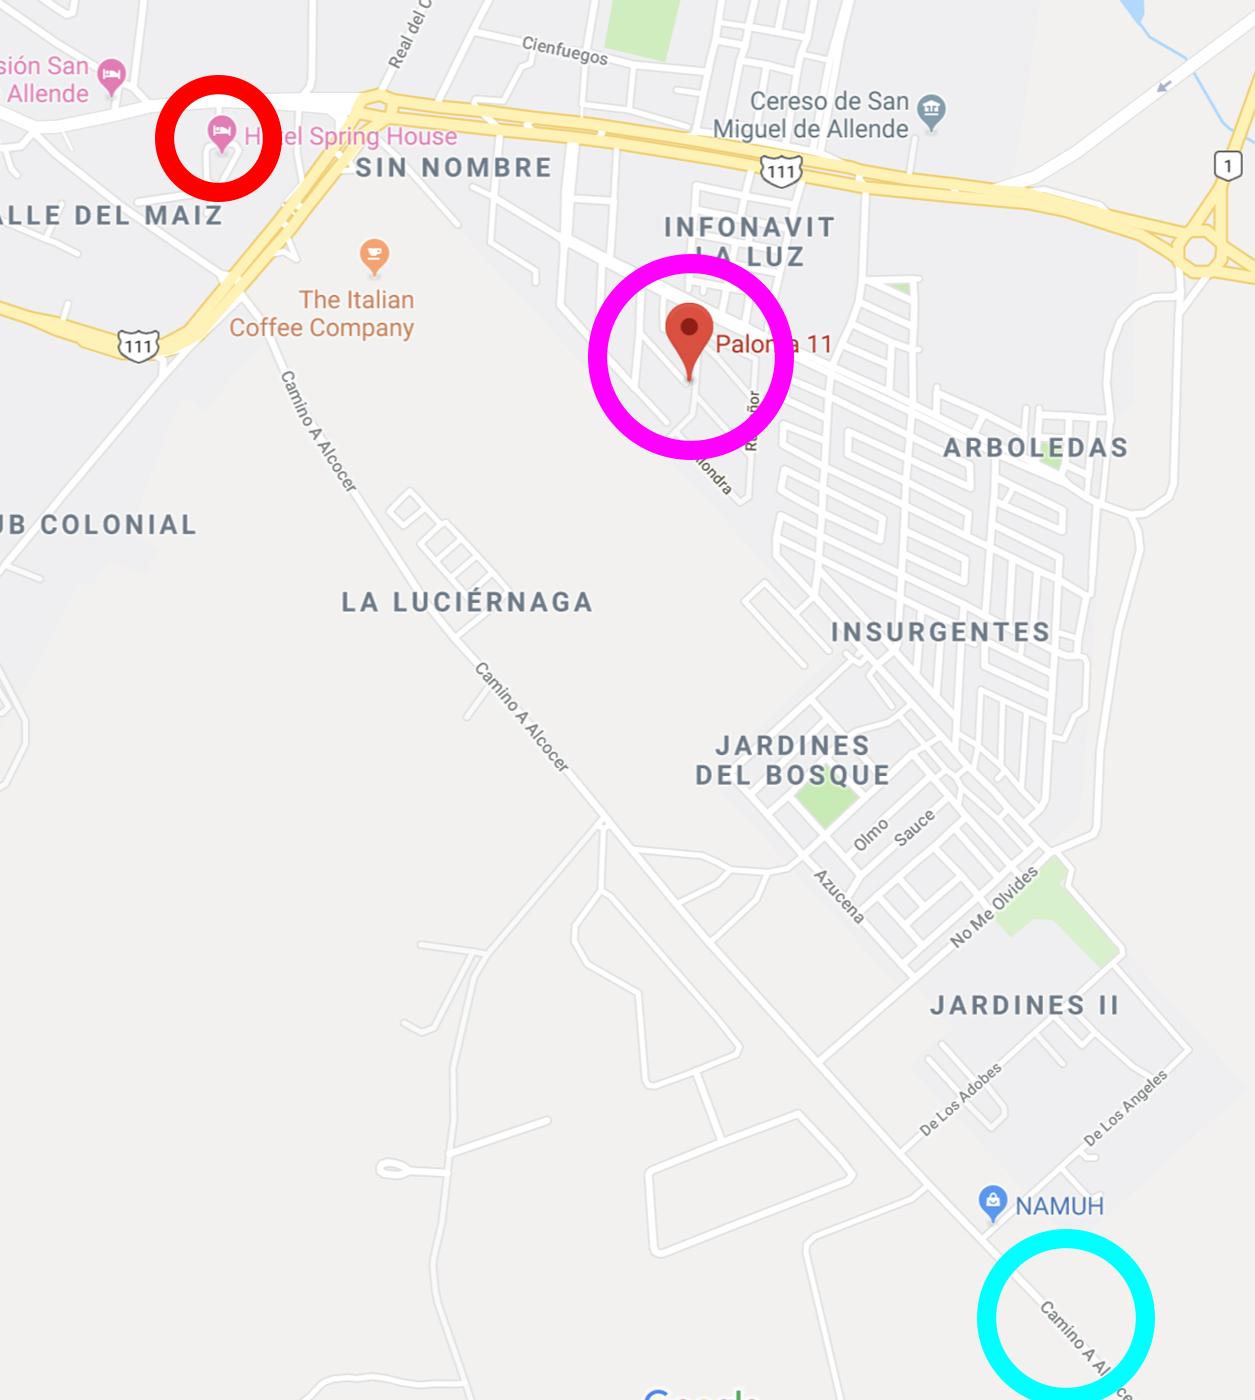 STUDIO, pink circle. JERRY'S HOME, blue circle. HOTEL CASA PRIMAVERA, red circle.